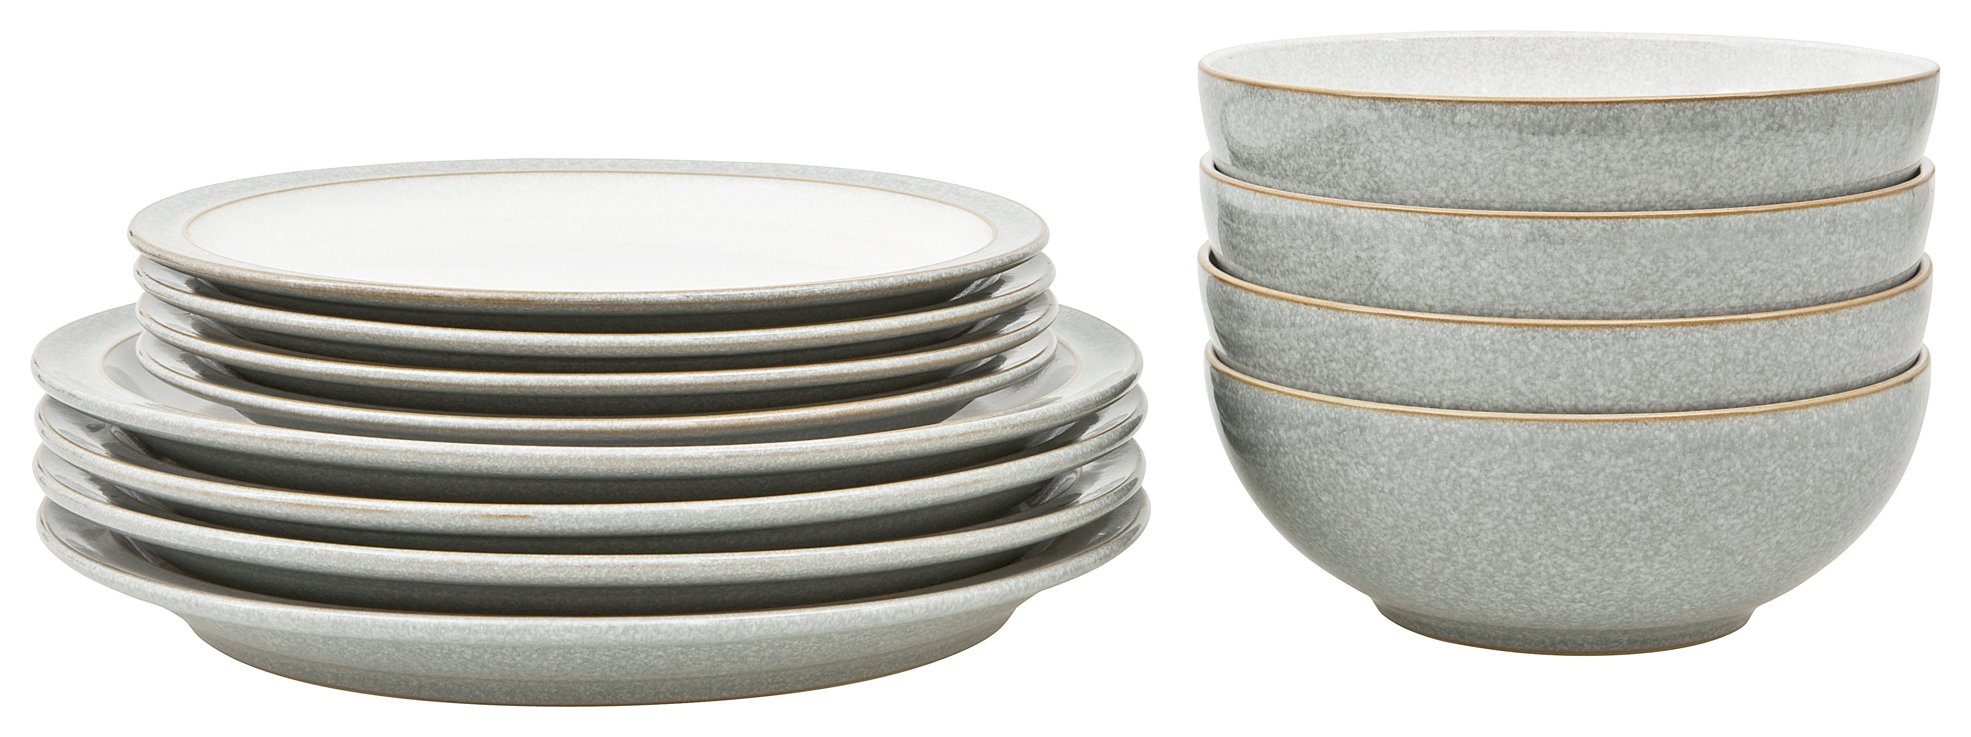 Denby Elements 12 Piece Ceramic Tableware - Light Grey